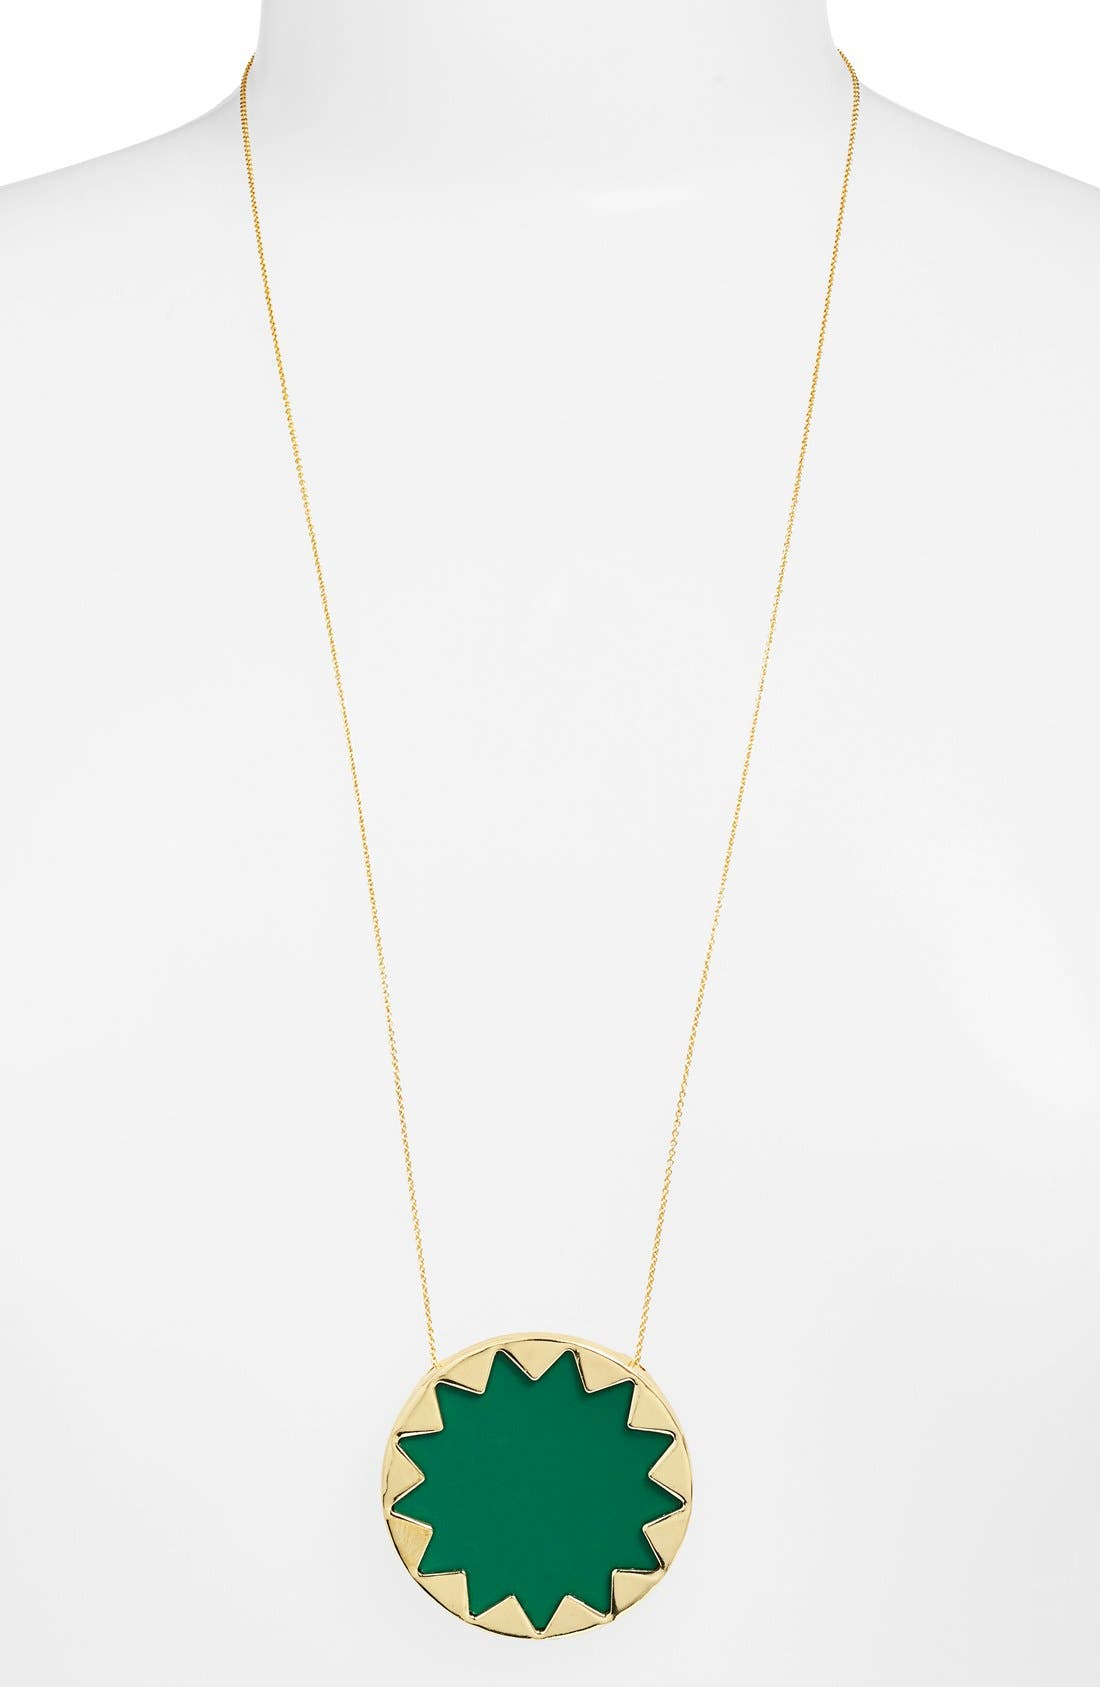 Alternate Image 1 Selected - House of Harlow 1960 Sunburst Pendant Necklace